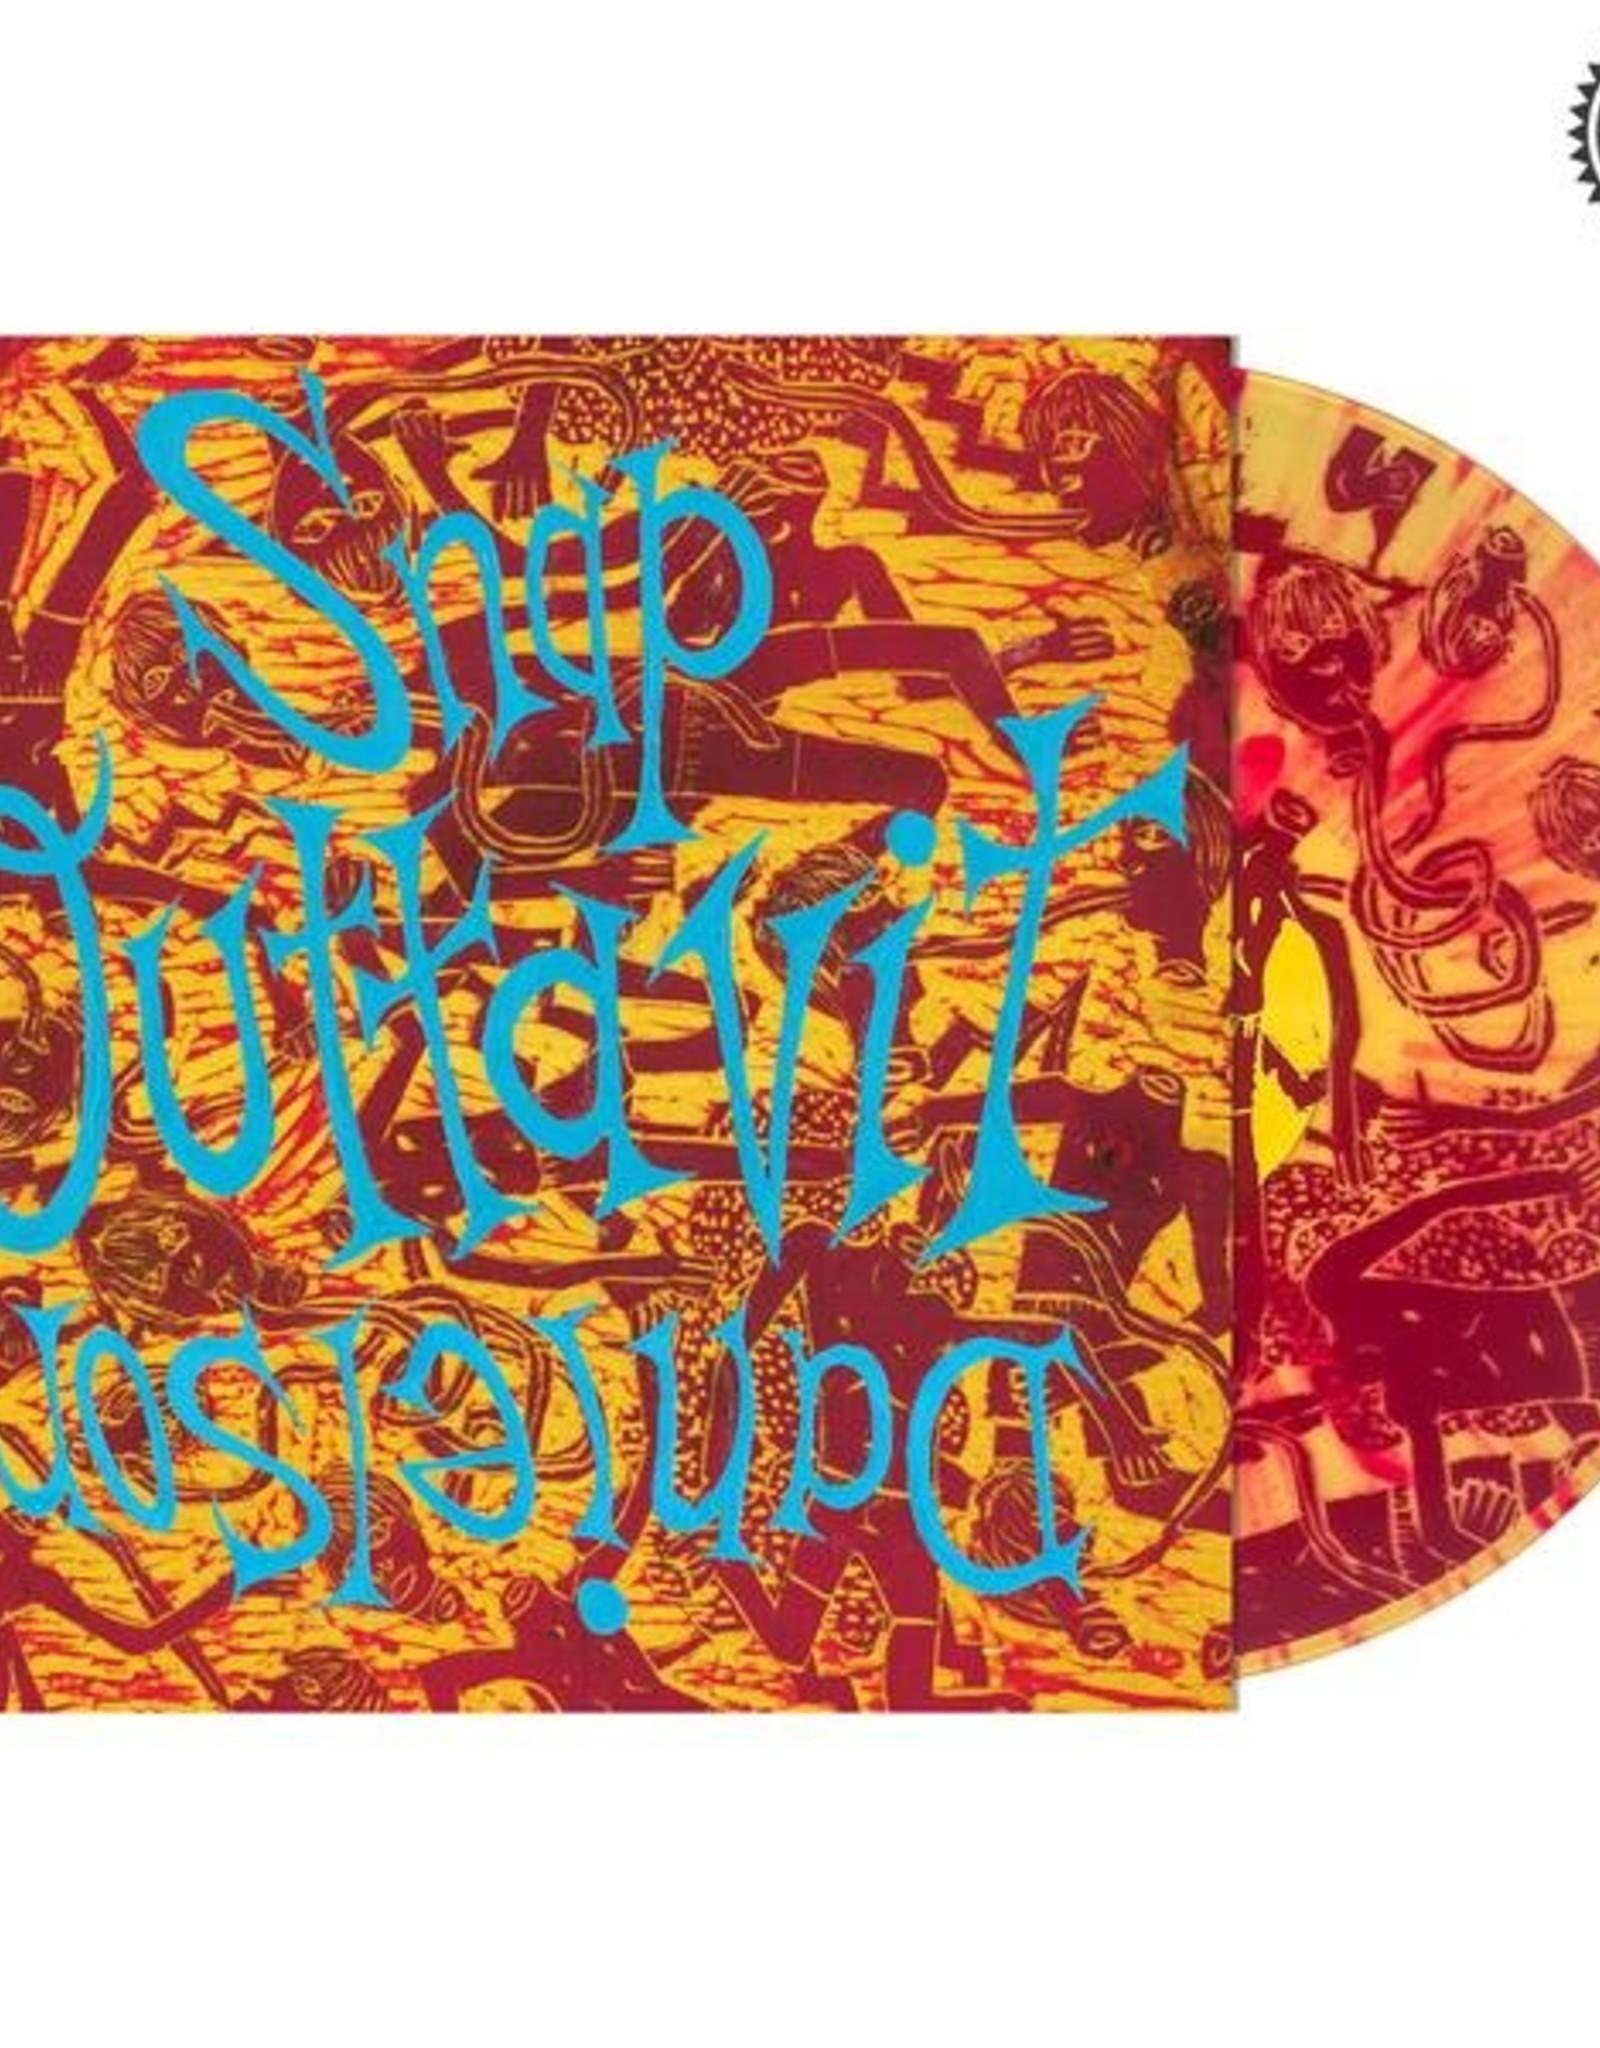 Danielson - Snap Outtavit (Yellow Vinyl)